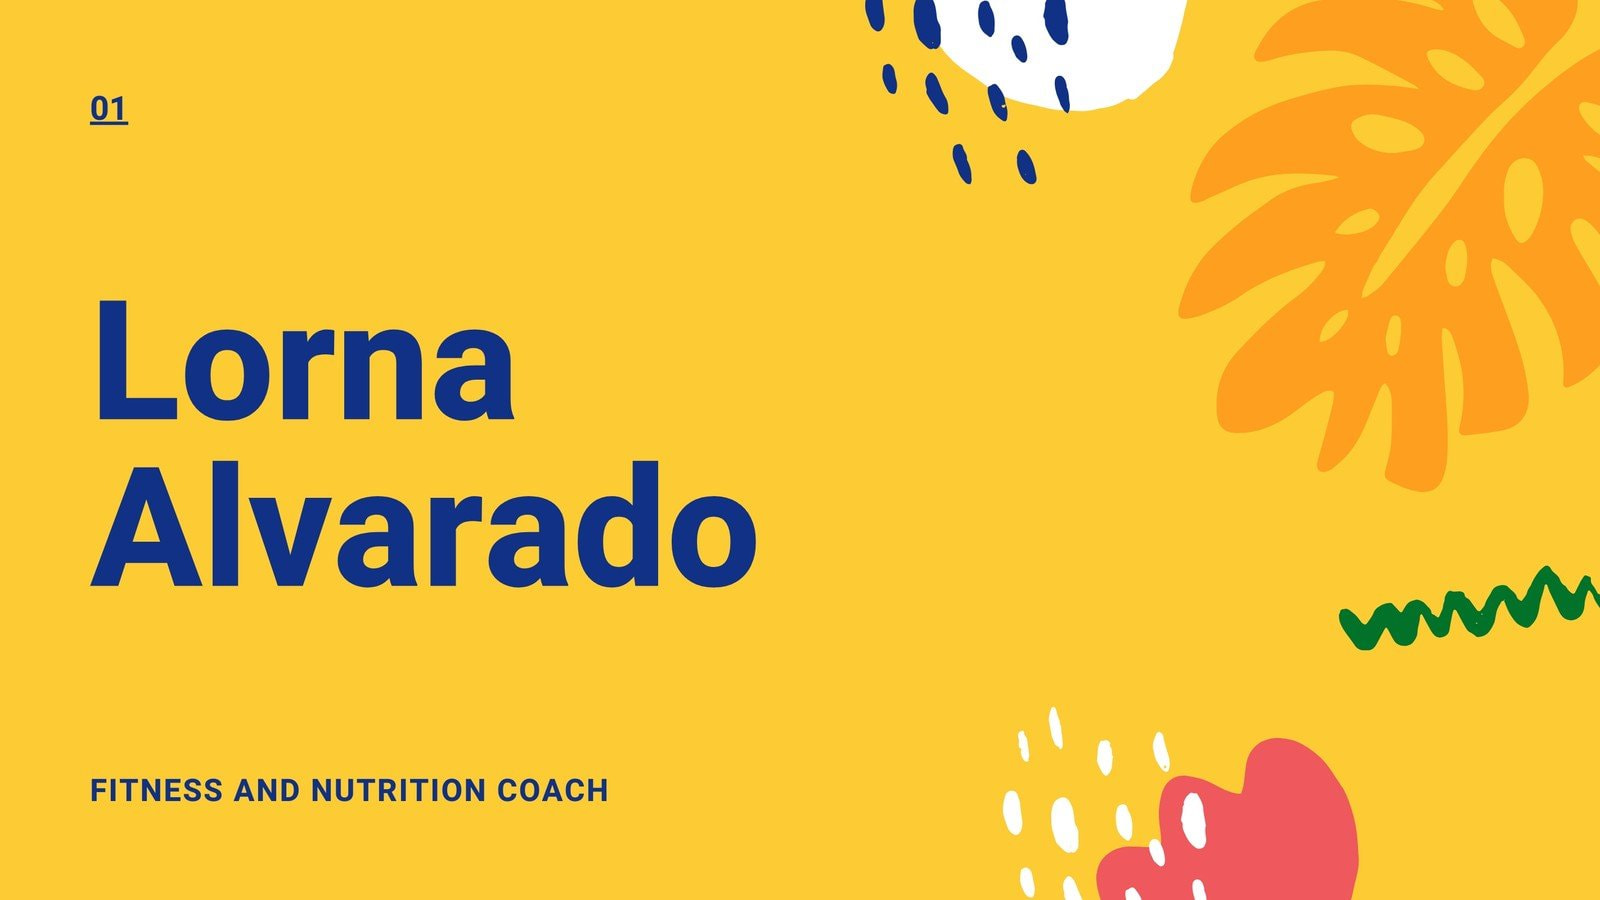 Yellow Fun and Playful Organic Nutrition Coach Marketing Presentation